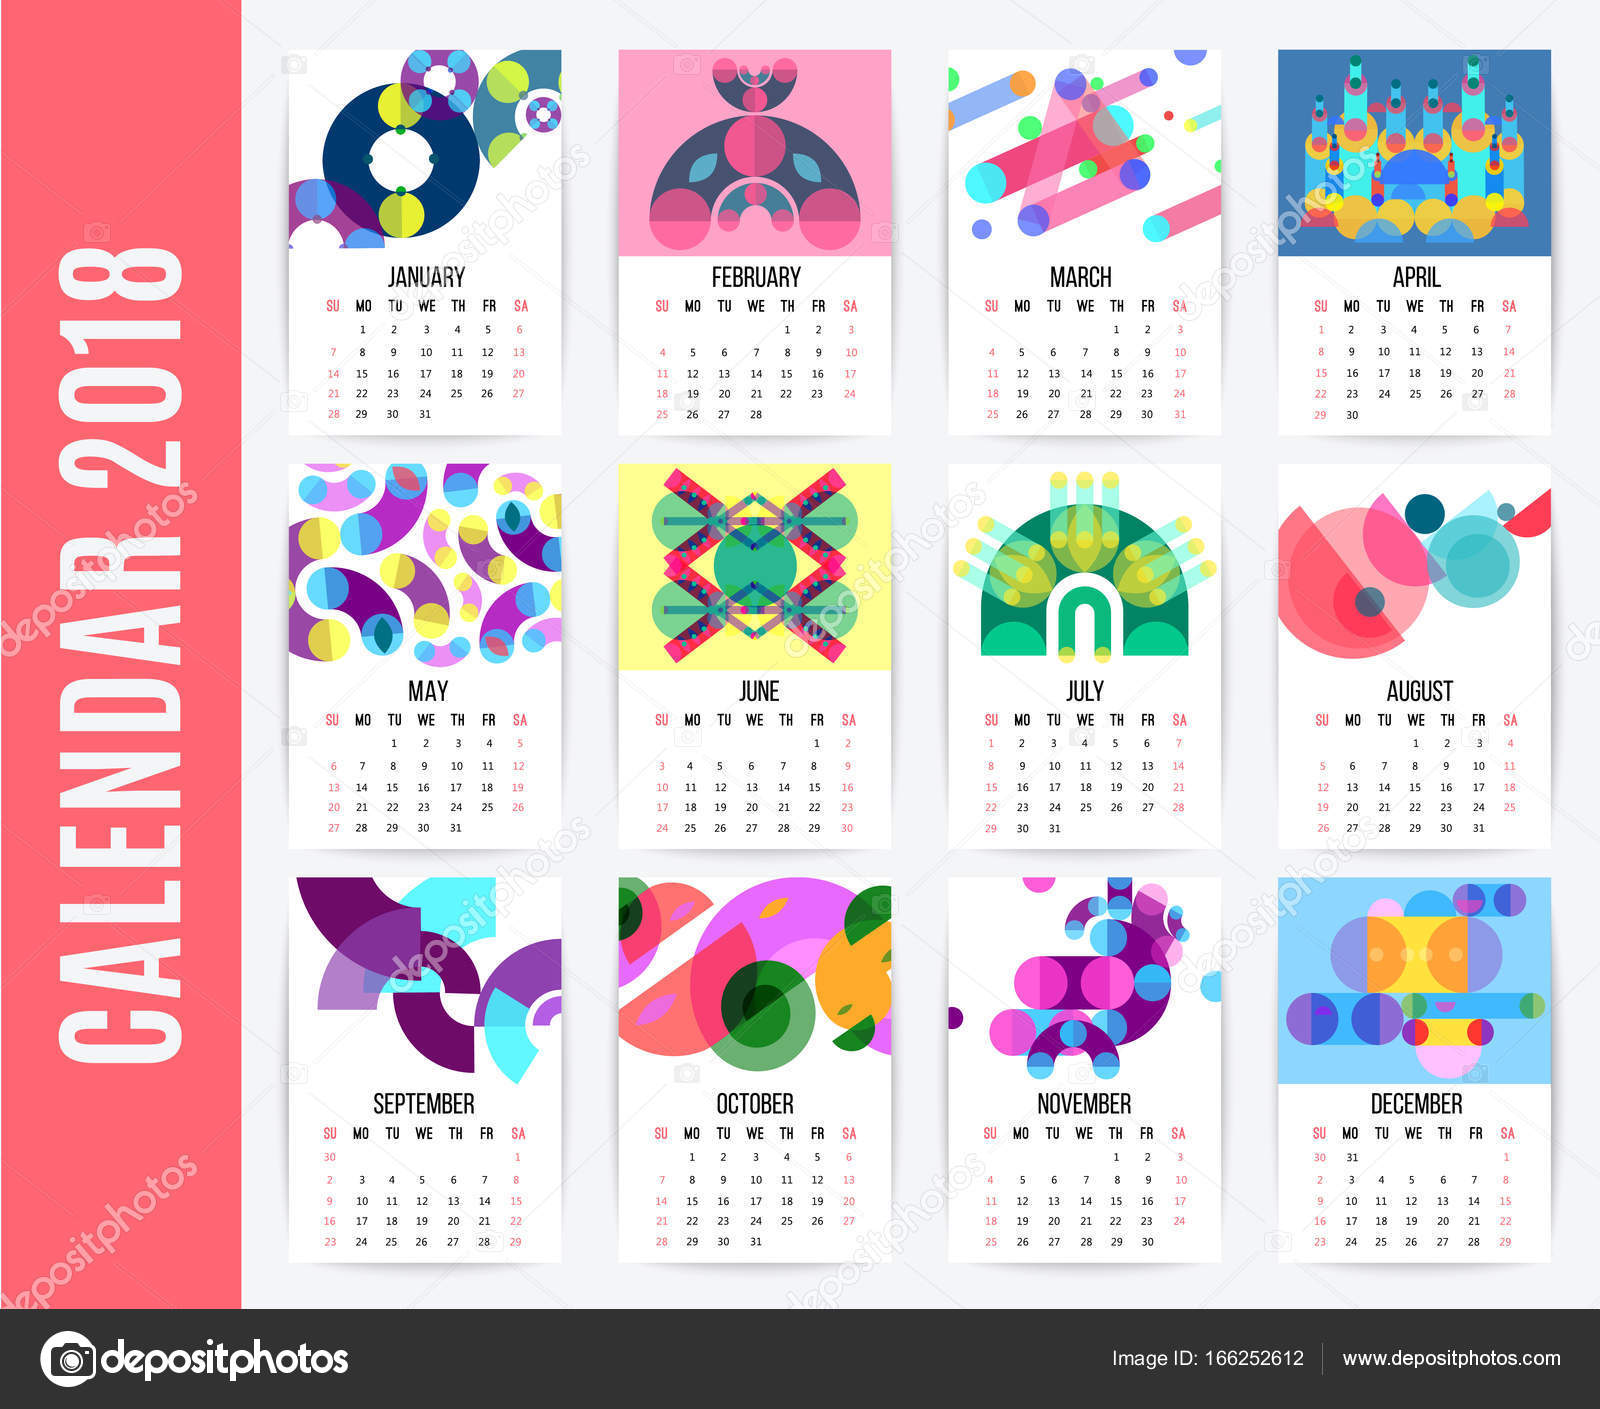 Calendar Design Html : 월별 달력 디자인 모음 — 스톡 벡터 macrovector